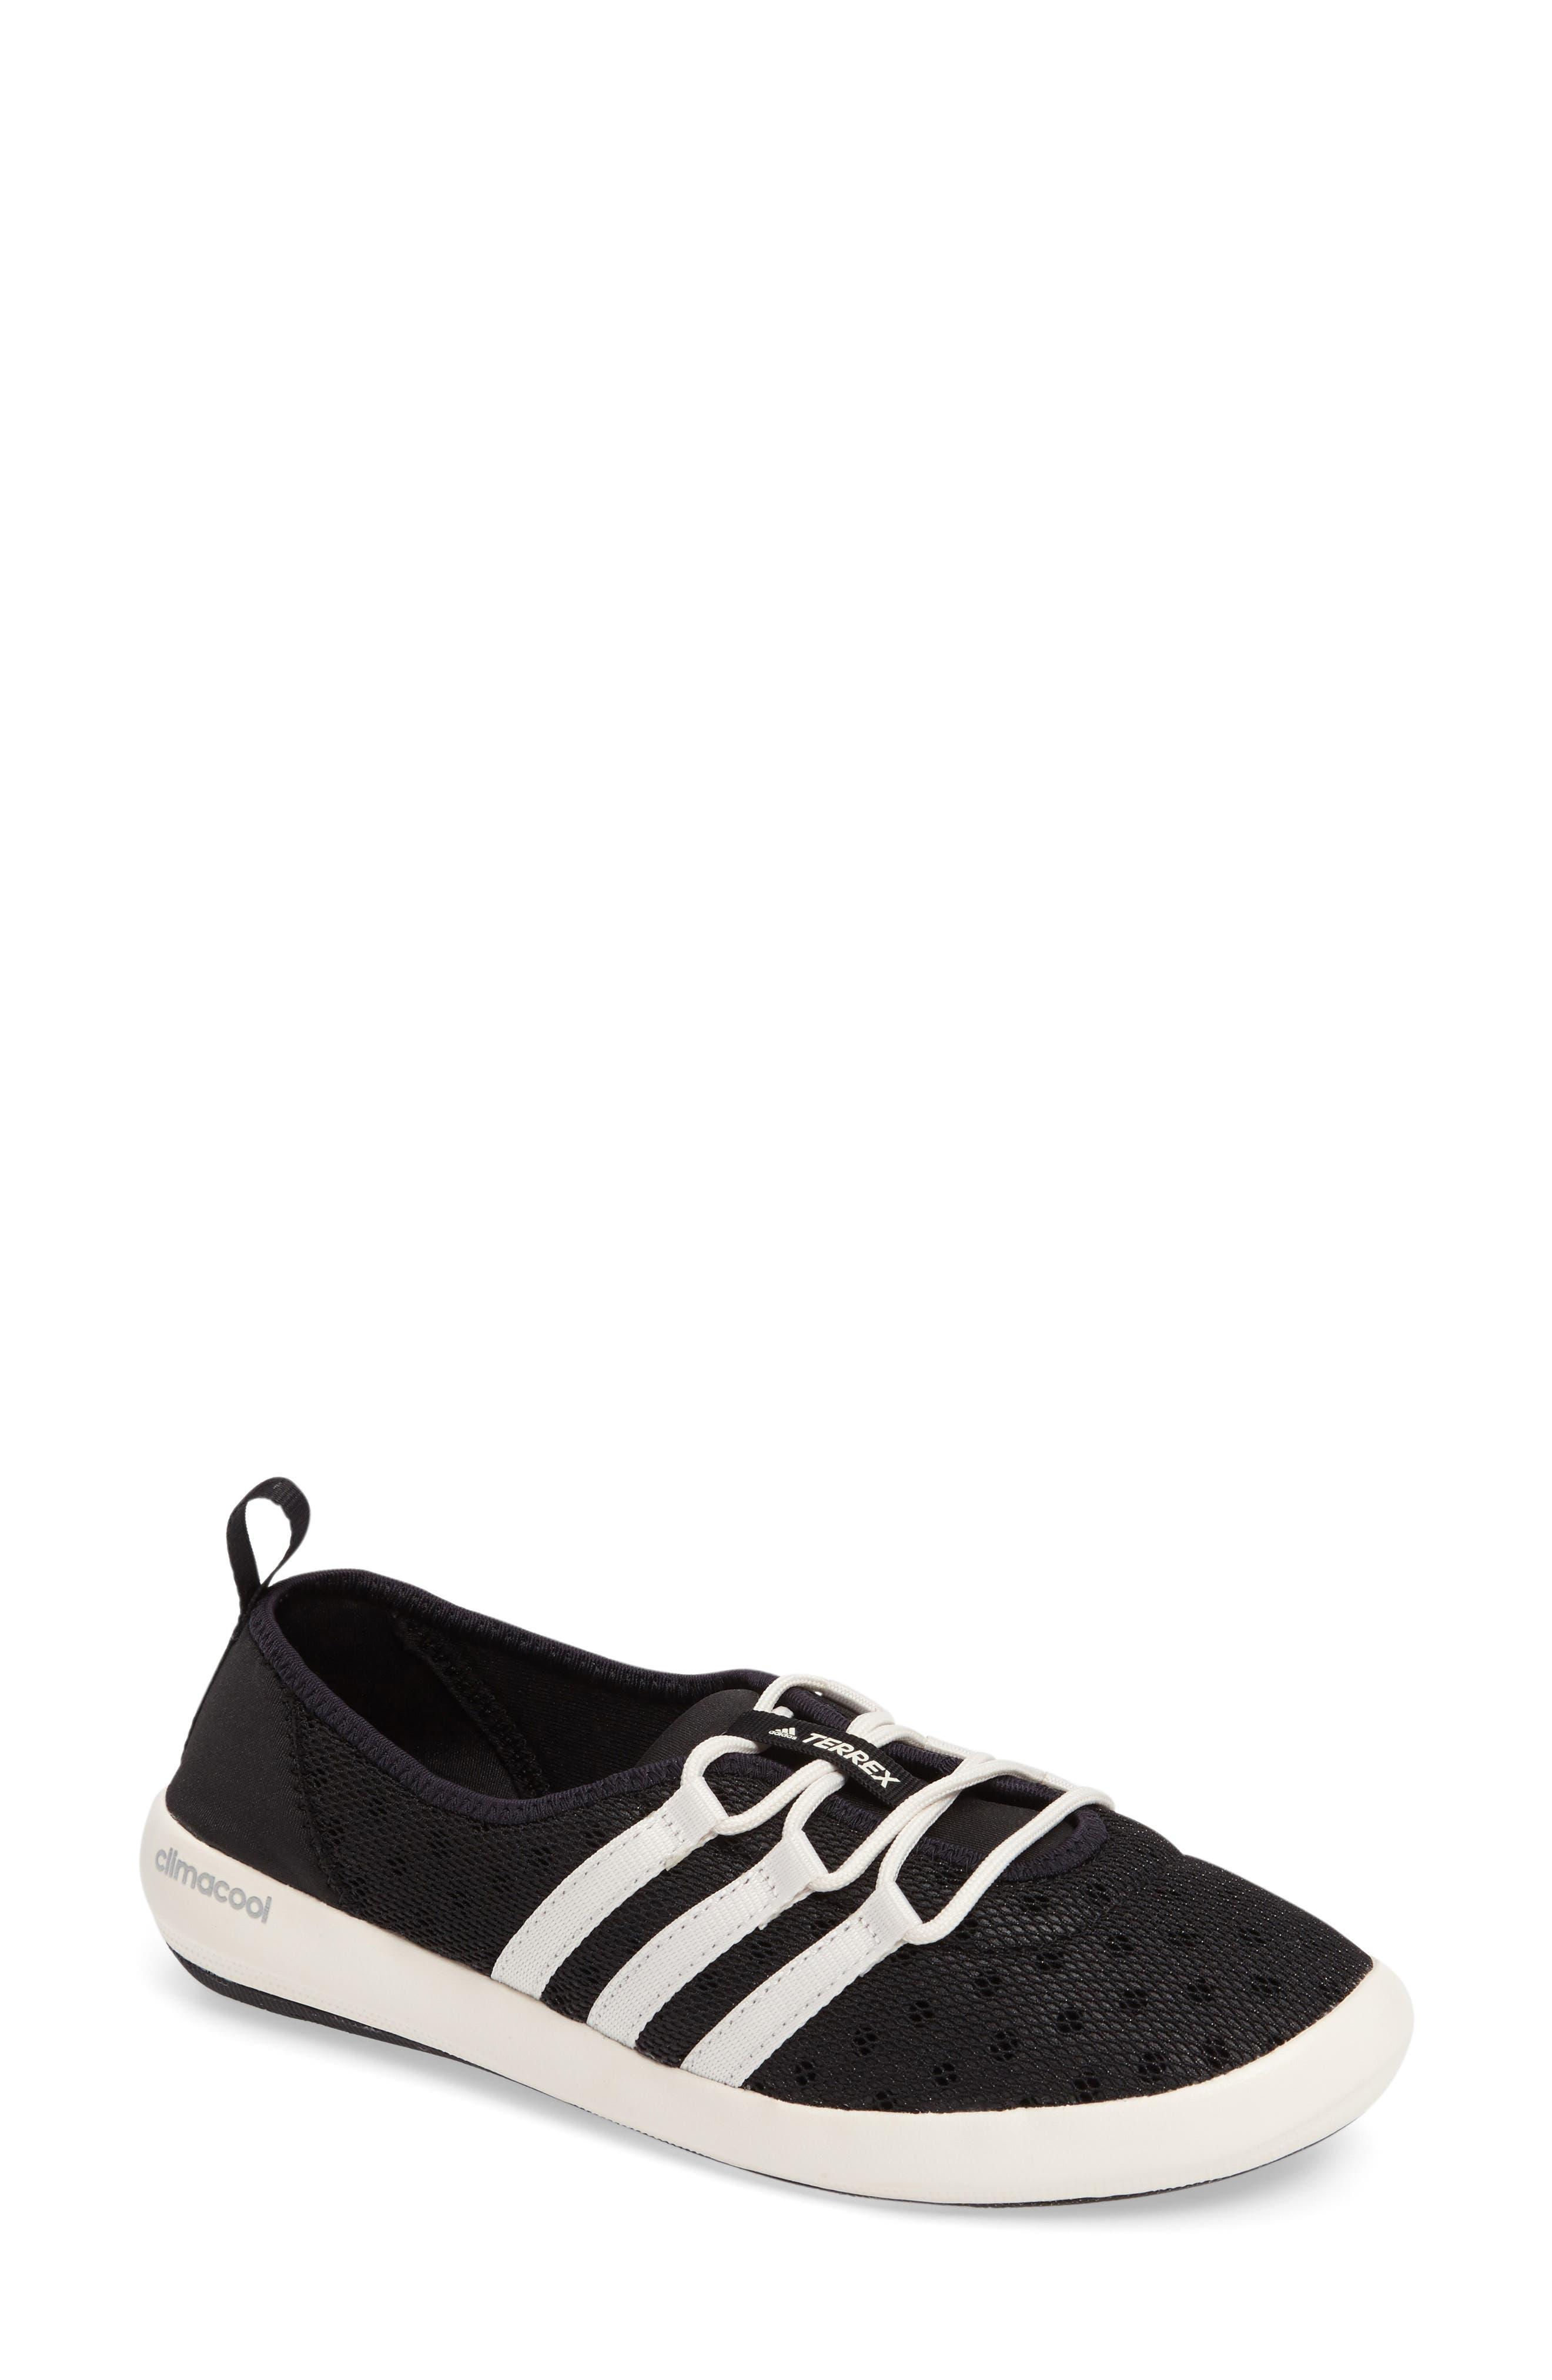 Terrex Climacool<sup>®</sup> Boat Shoe,                         Main,                         color,